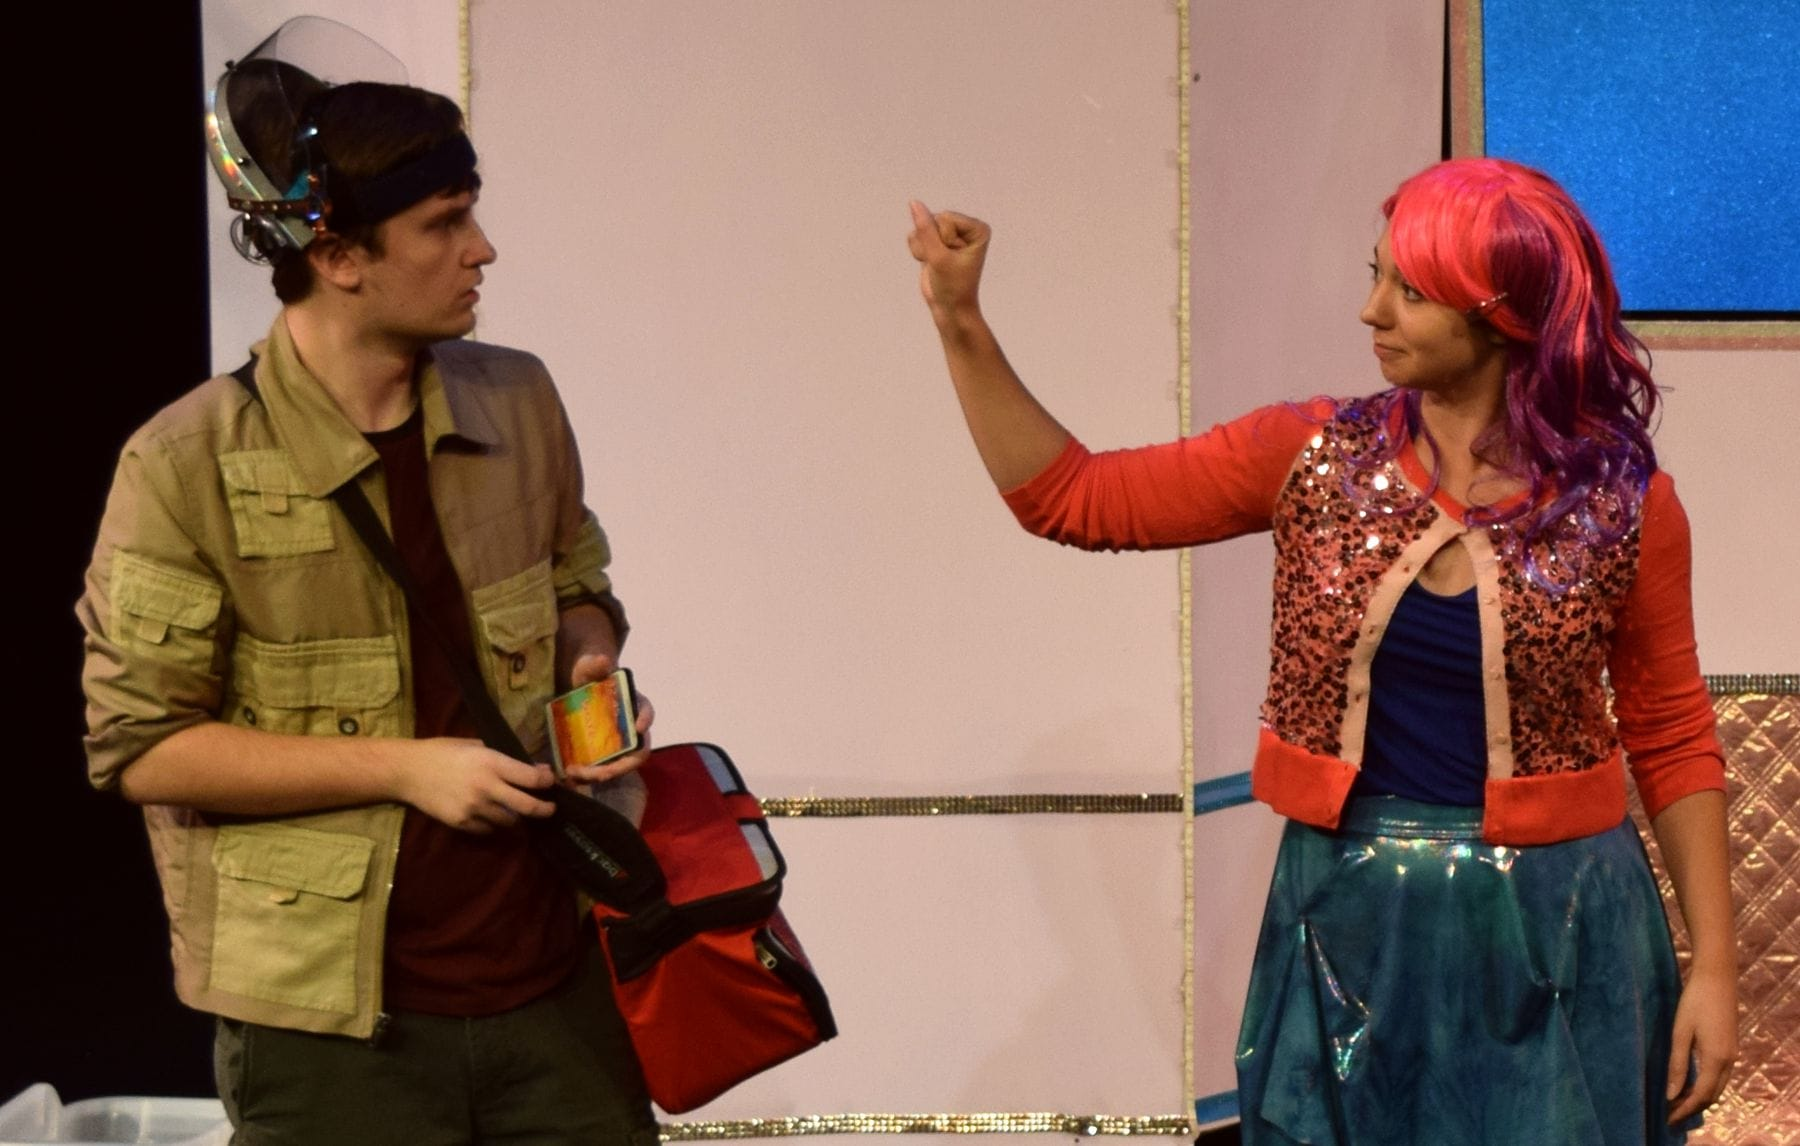 James Morogiello as Klipp Casey and Kelsey Yudice as Ineka Bradley in Voytto Tech. Photo by Steve Wolf.